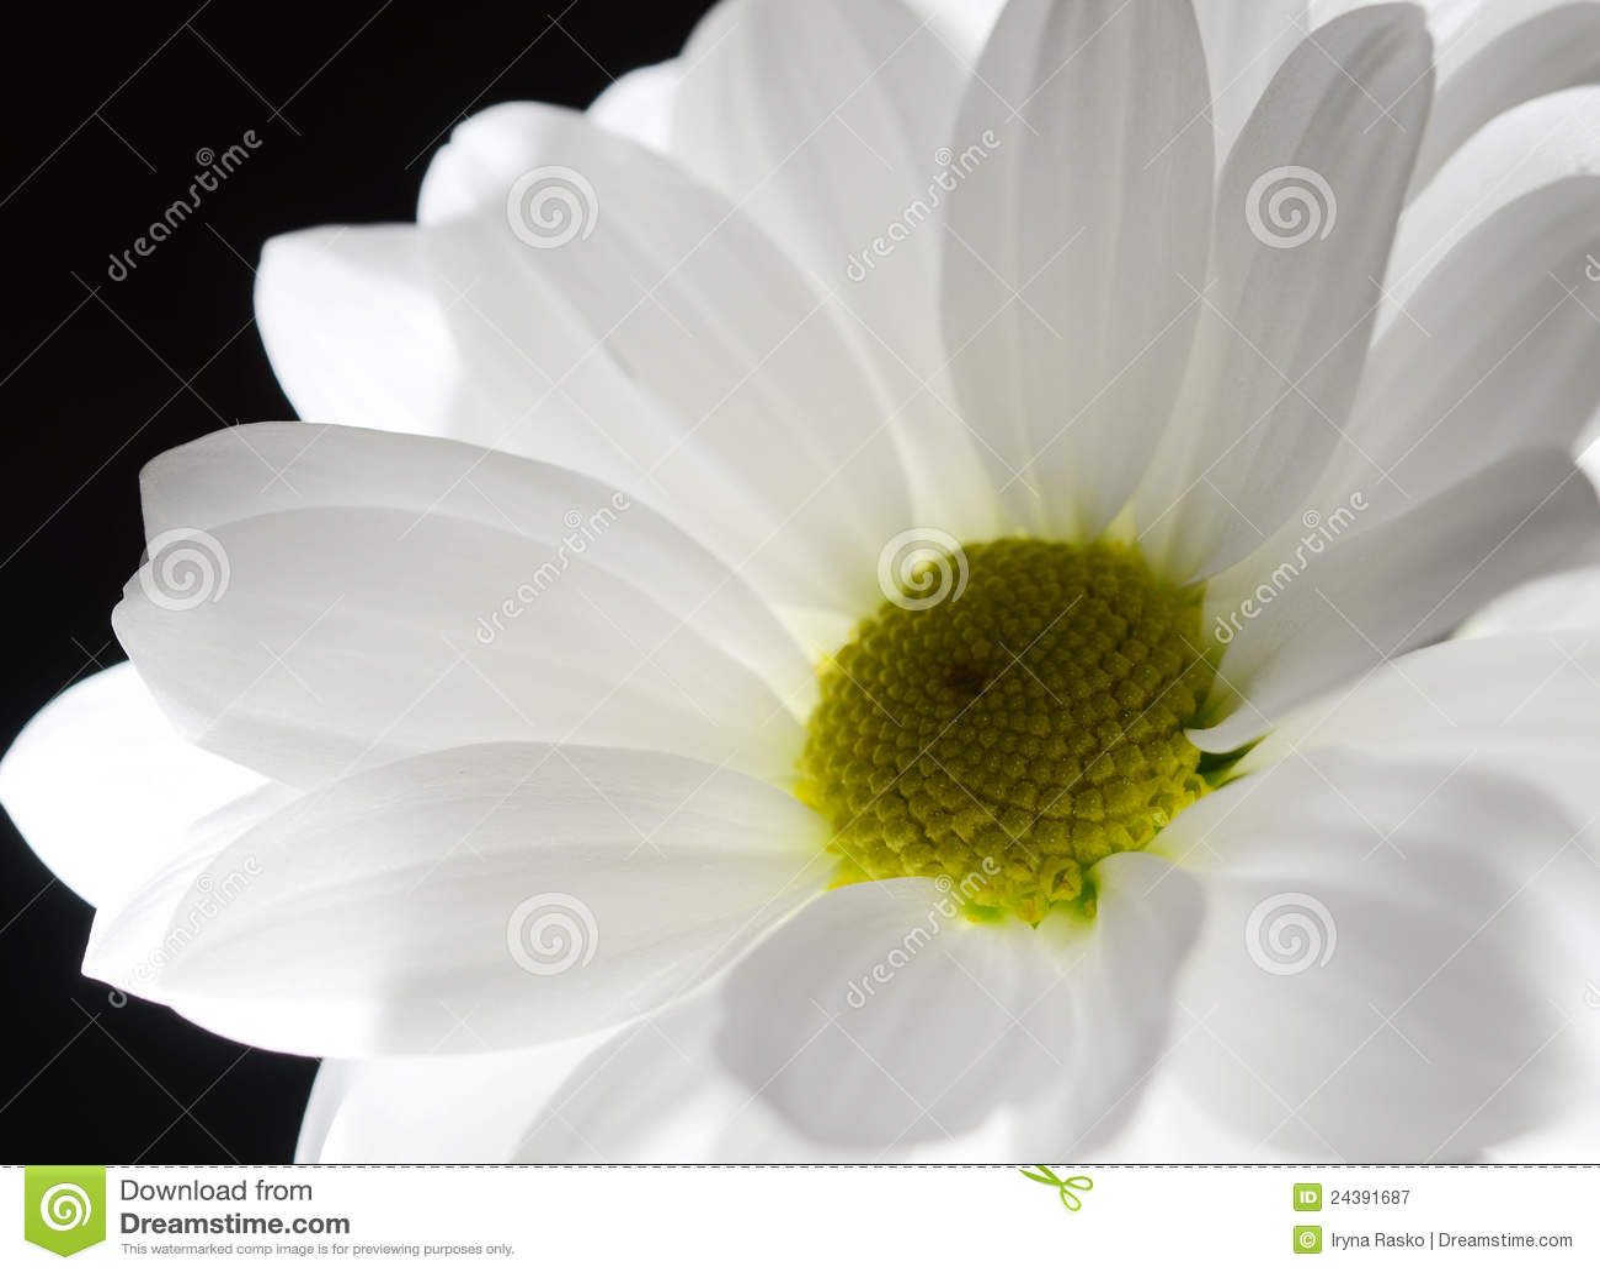 One White Flower On Black Background Stock Image Image Of Nature